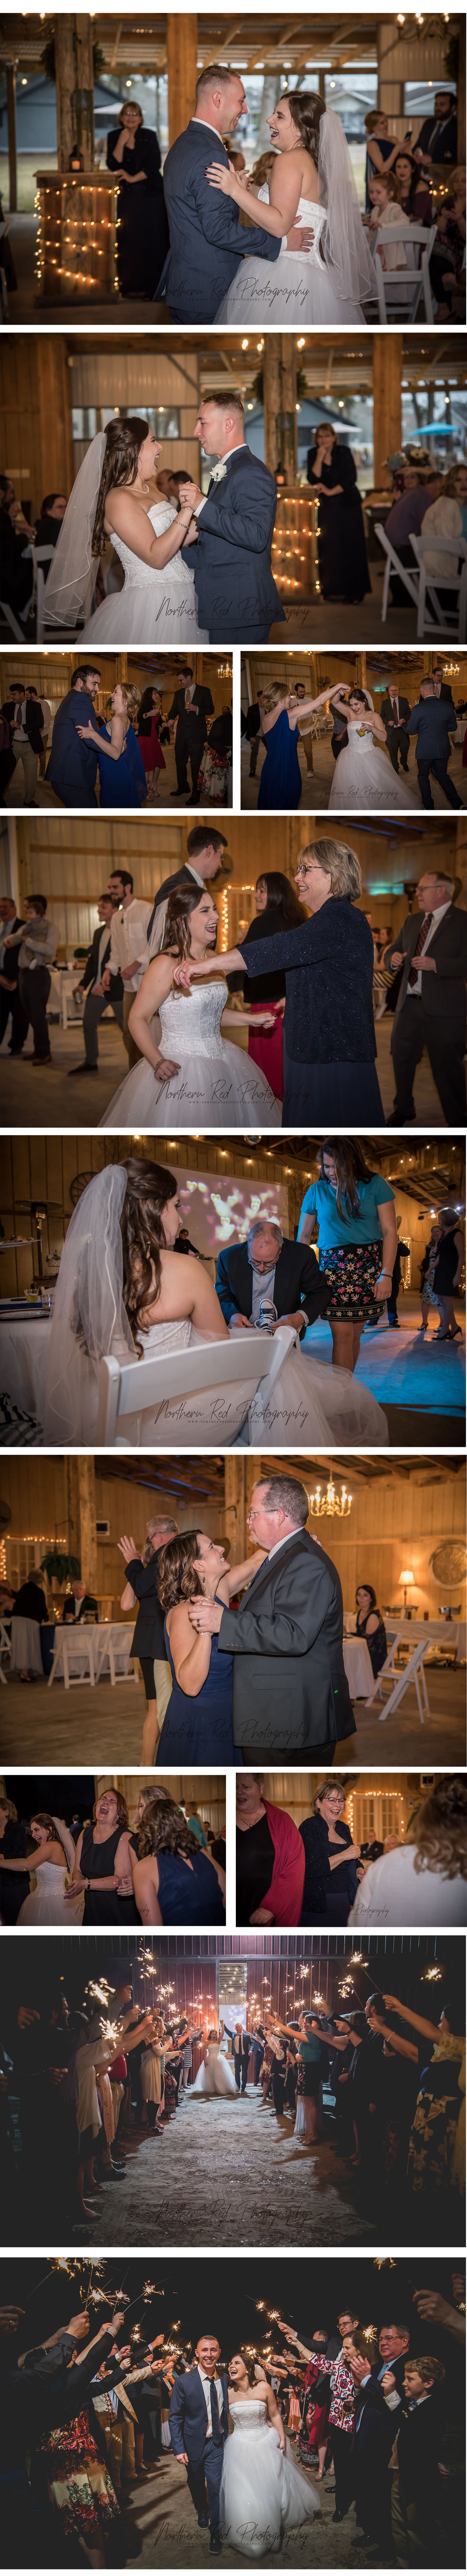 Georgia Wedding Photographer | Northern Red Photography